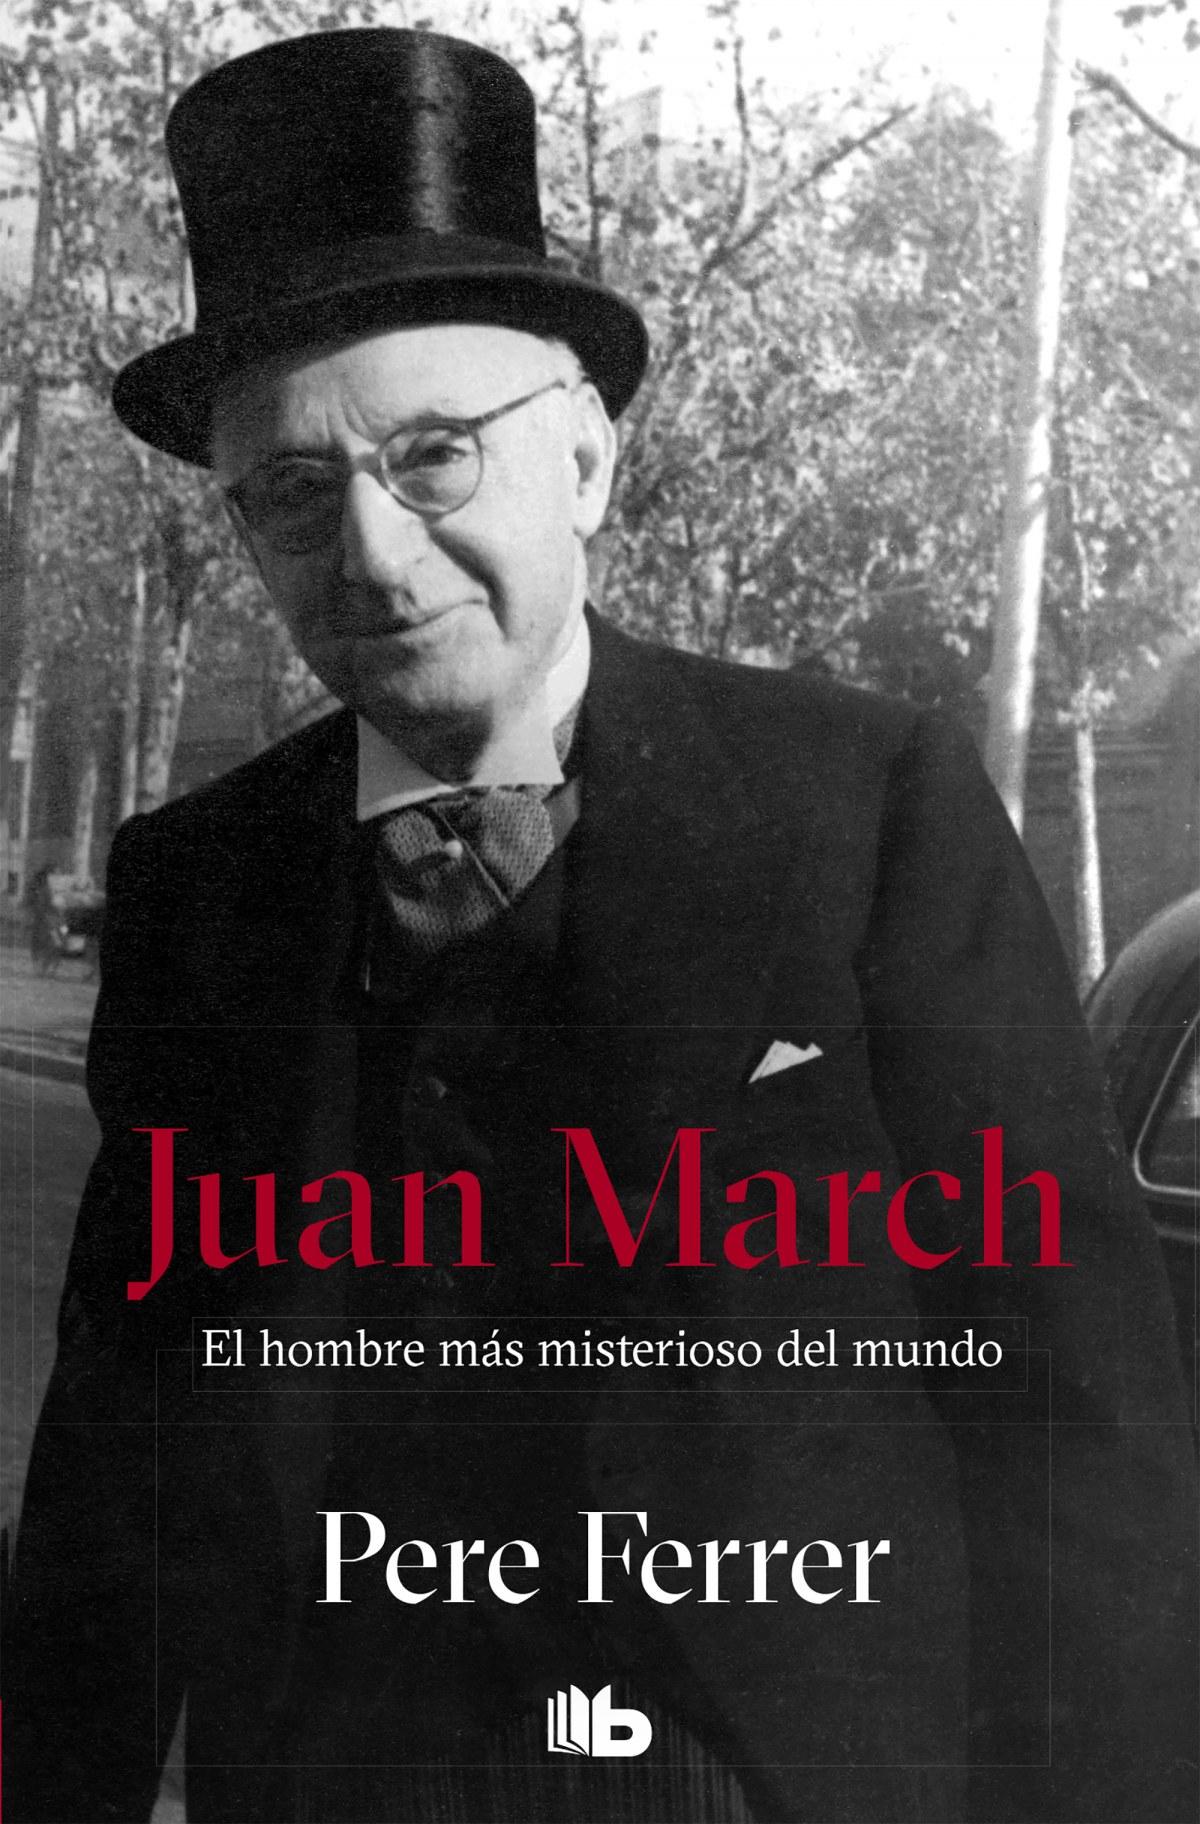 JUAN MARCH